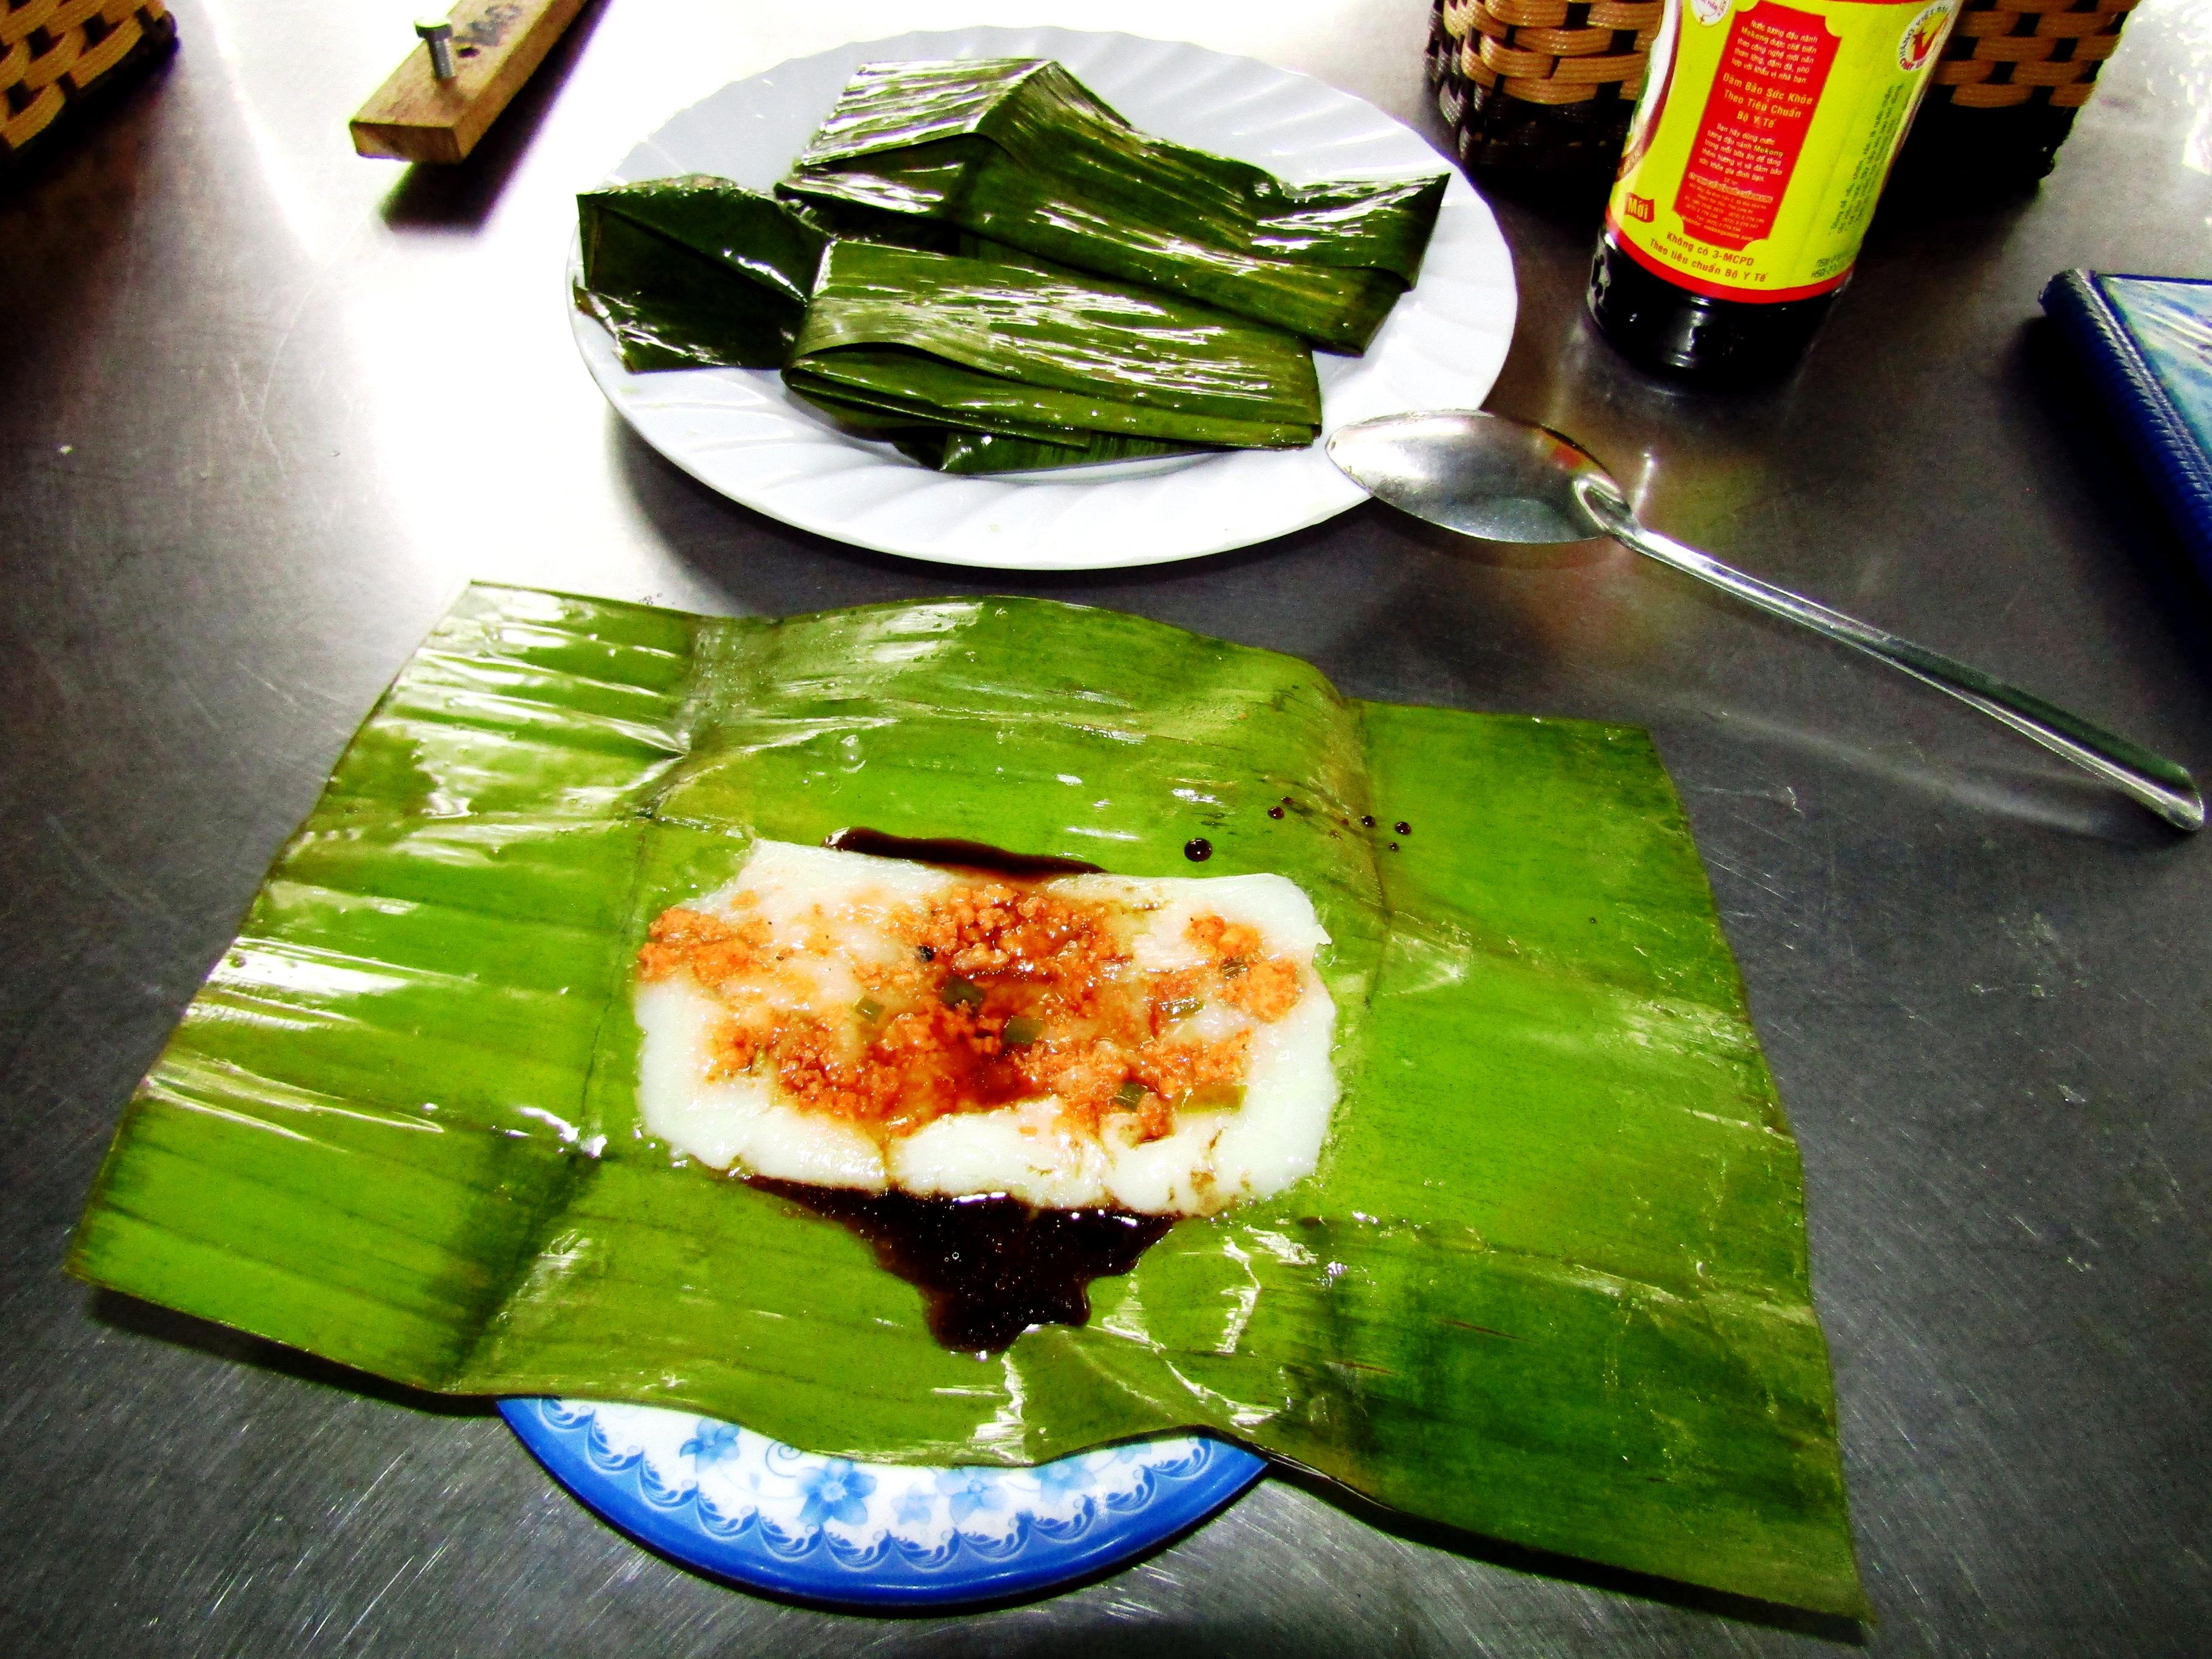 Bánh Bèo, Nậm, Lọc - the speciality of Hue